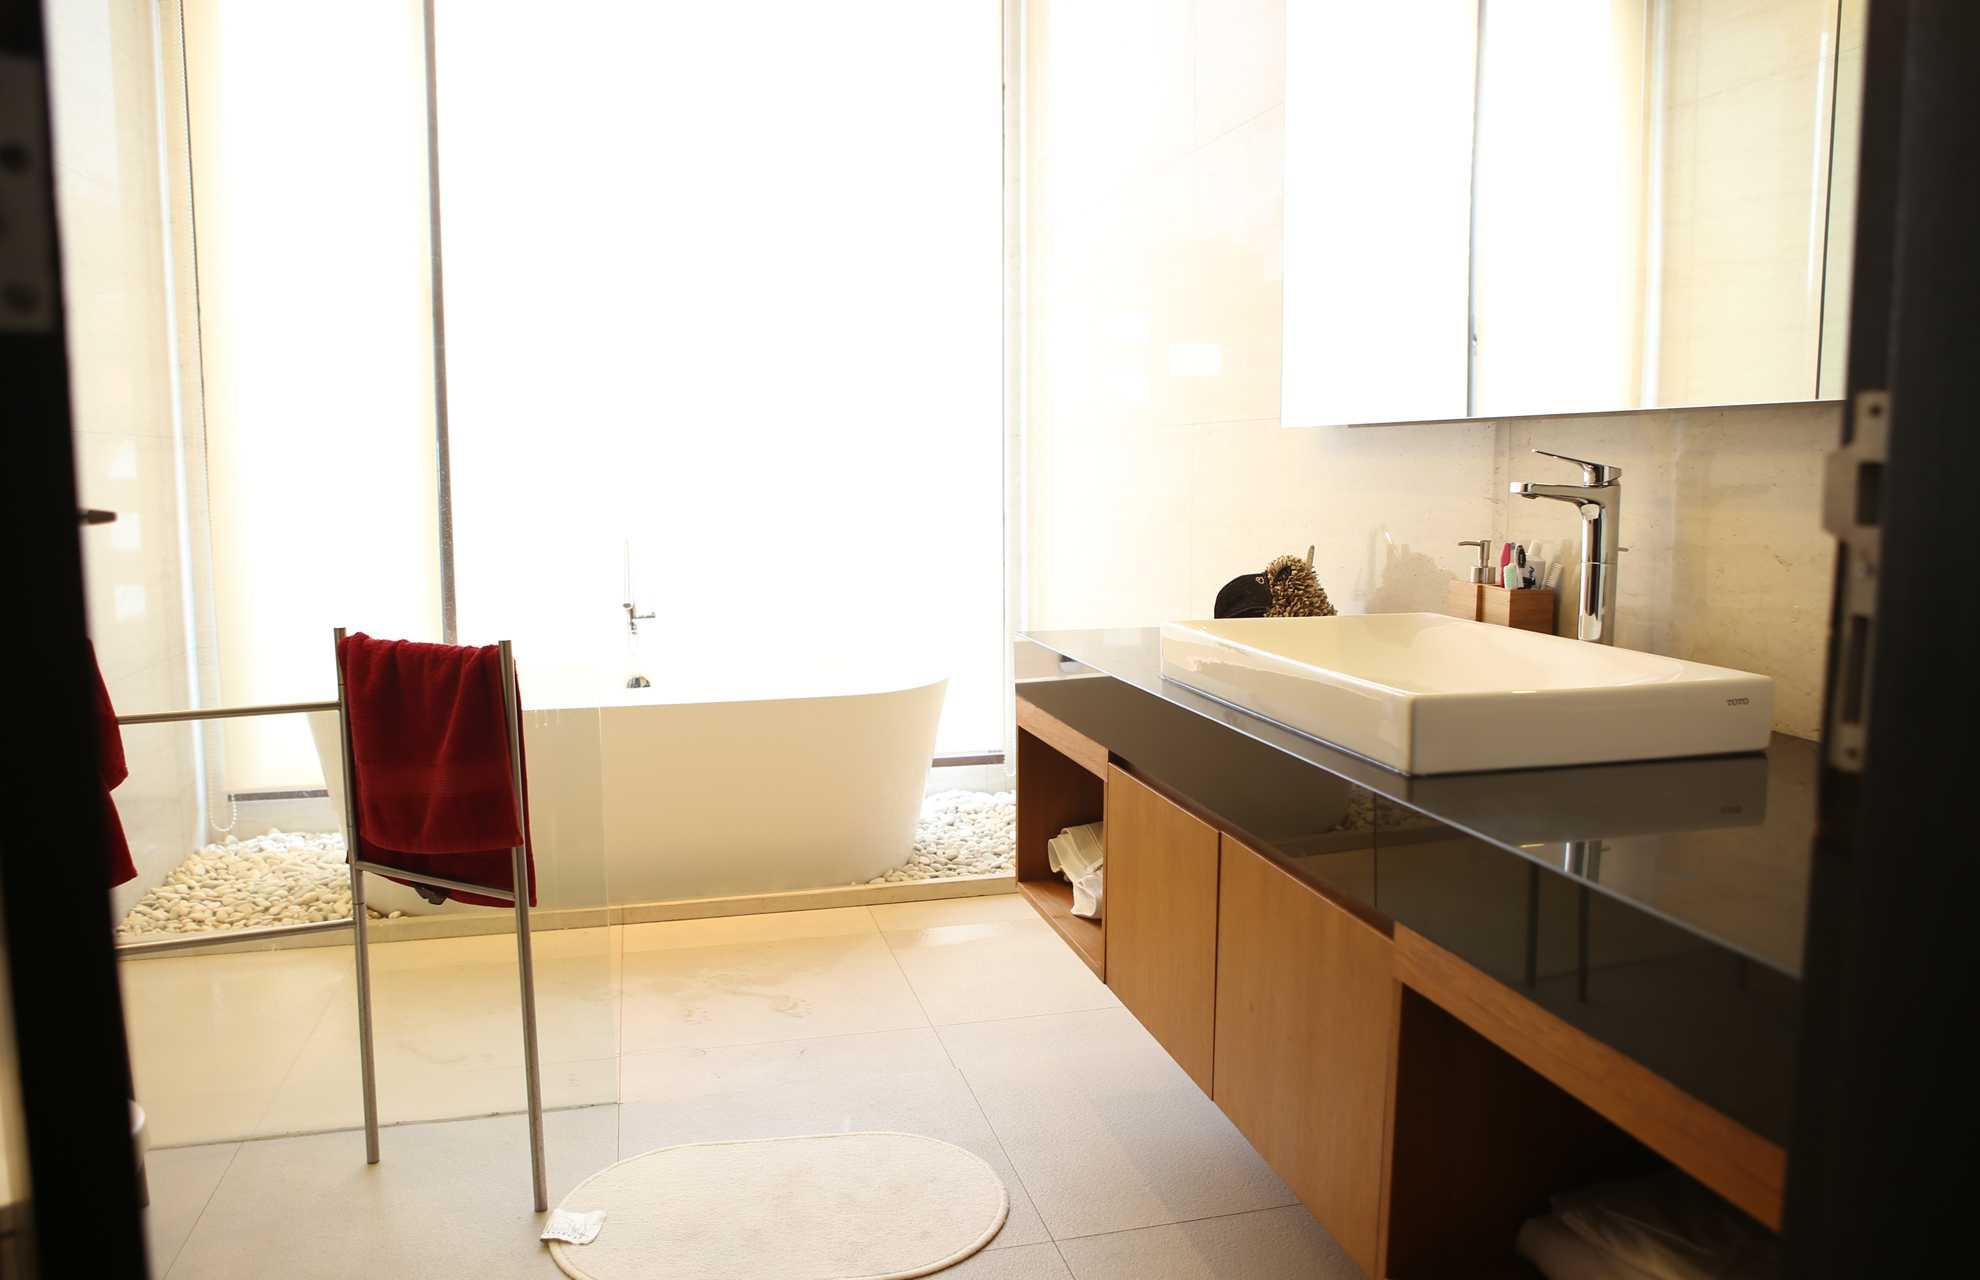 Home By Fabelio.com Cipete Villa Cipete Sel., Cilandak, Kota Jakarta Selatan, Daerah Khusus Ibukota Jakarta, Indonesia Cipete Sel., Cilandak, Kota Jakarta Selatan, Daerah Khusus Ibukota Jakarta, Indonesia Bathroom Contemporary  54110